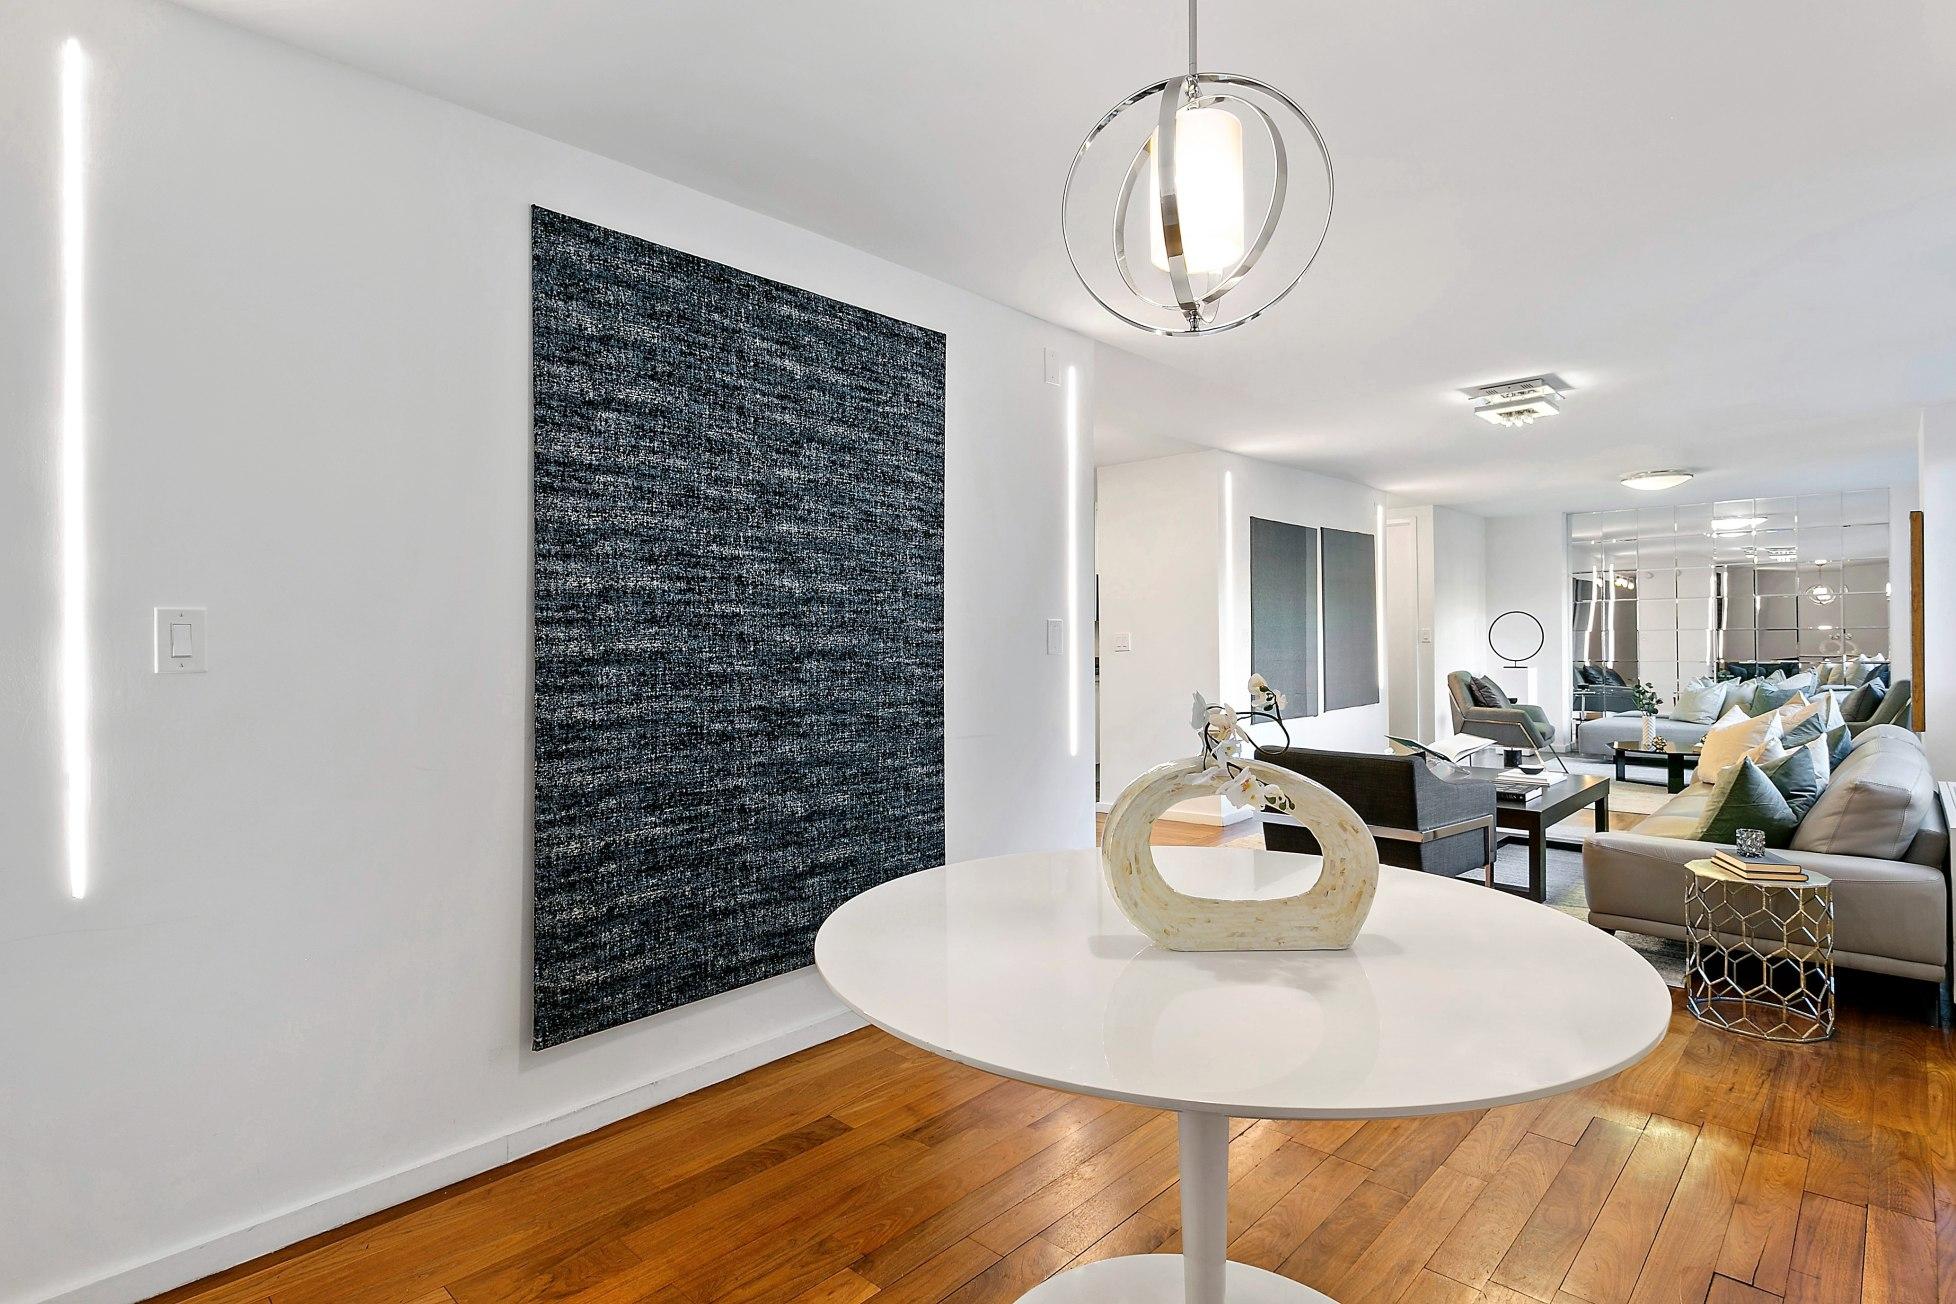 Apartment for sale at 515 East 72nd Street, Apt 3-KLMN